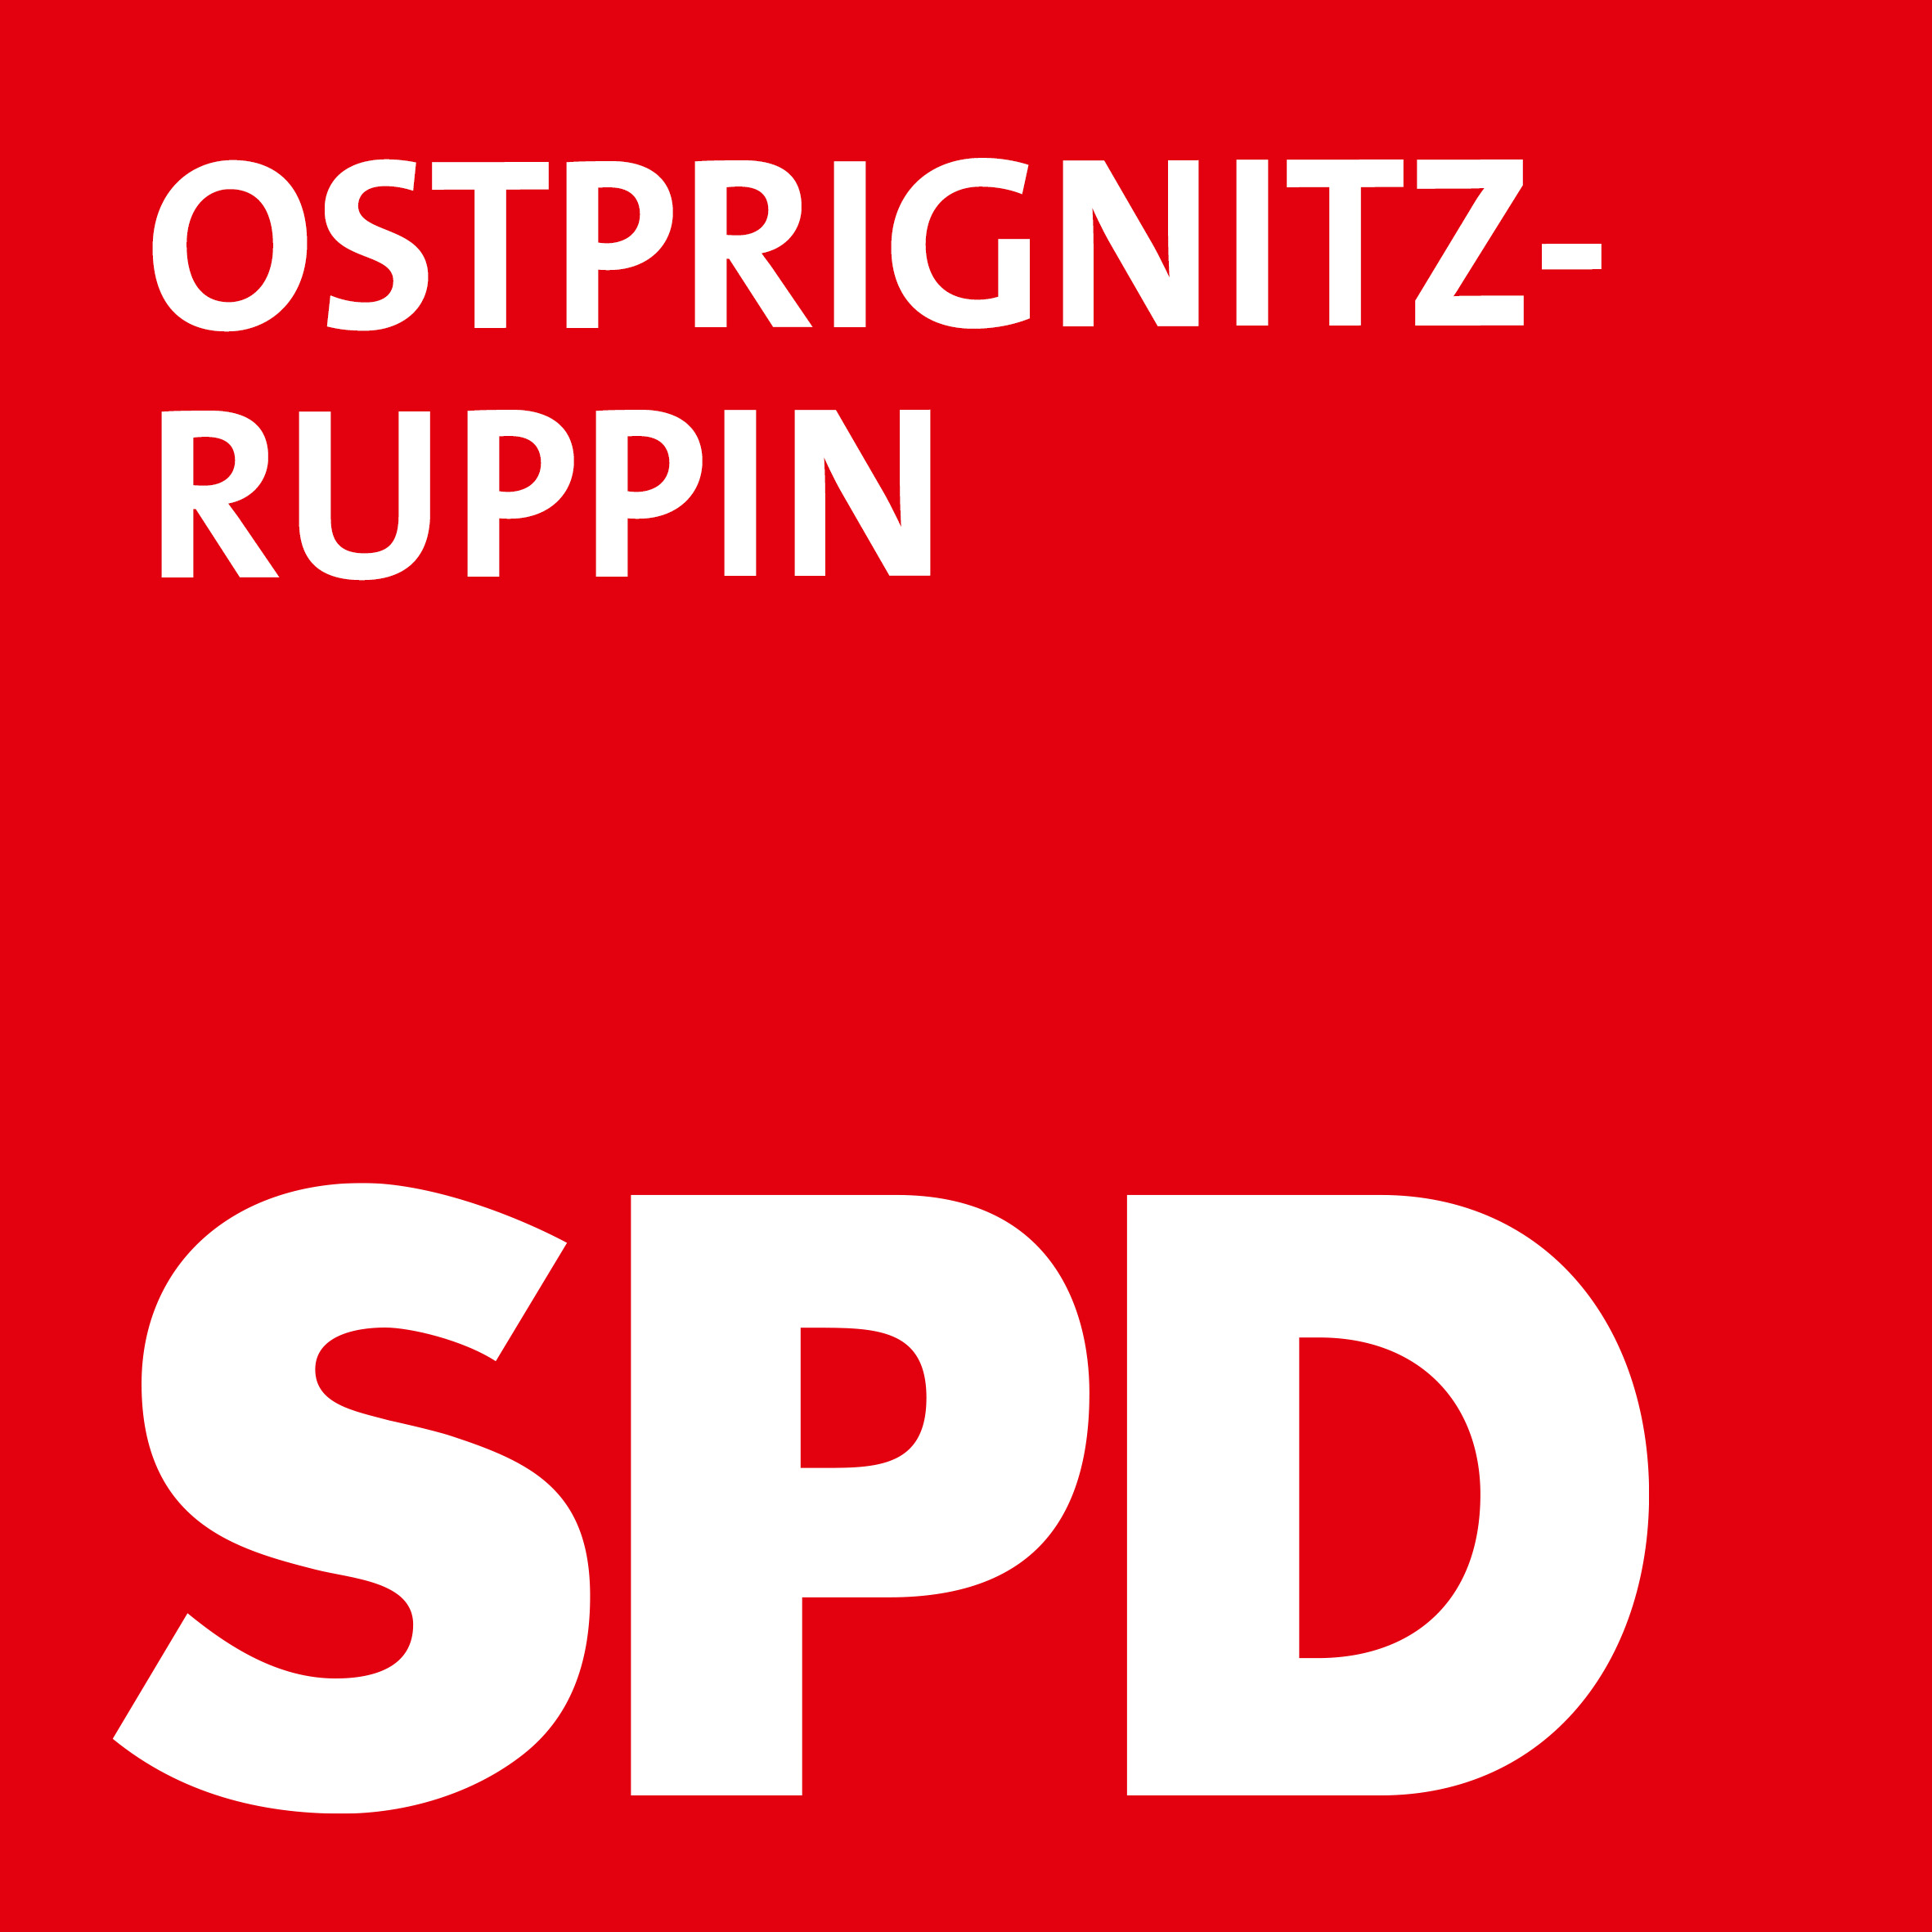 SPD Ostrignitz-Ruppin